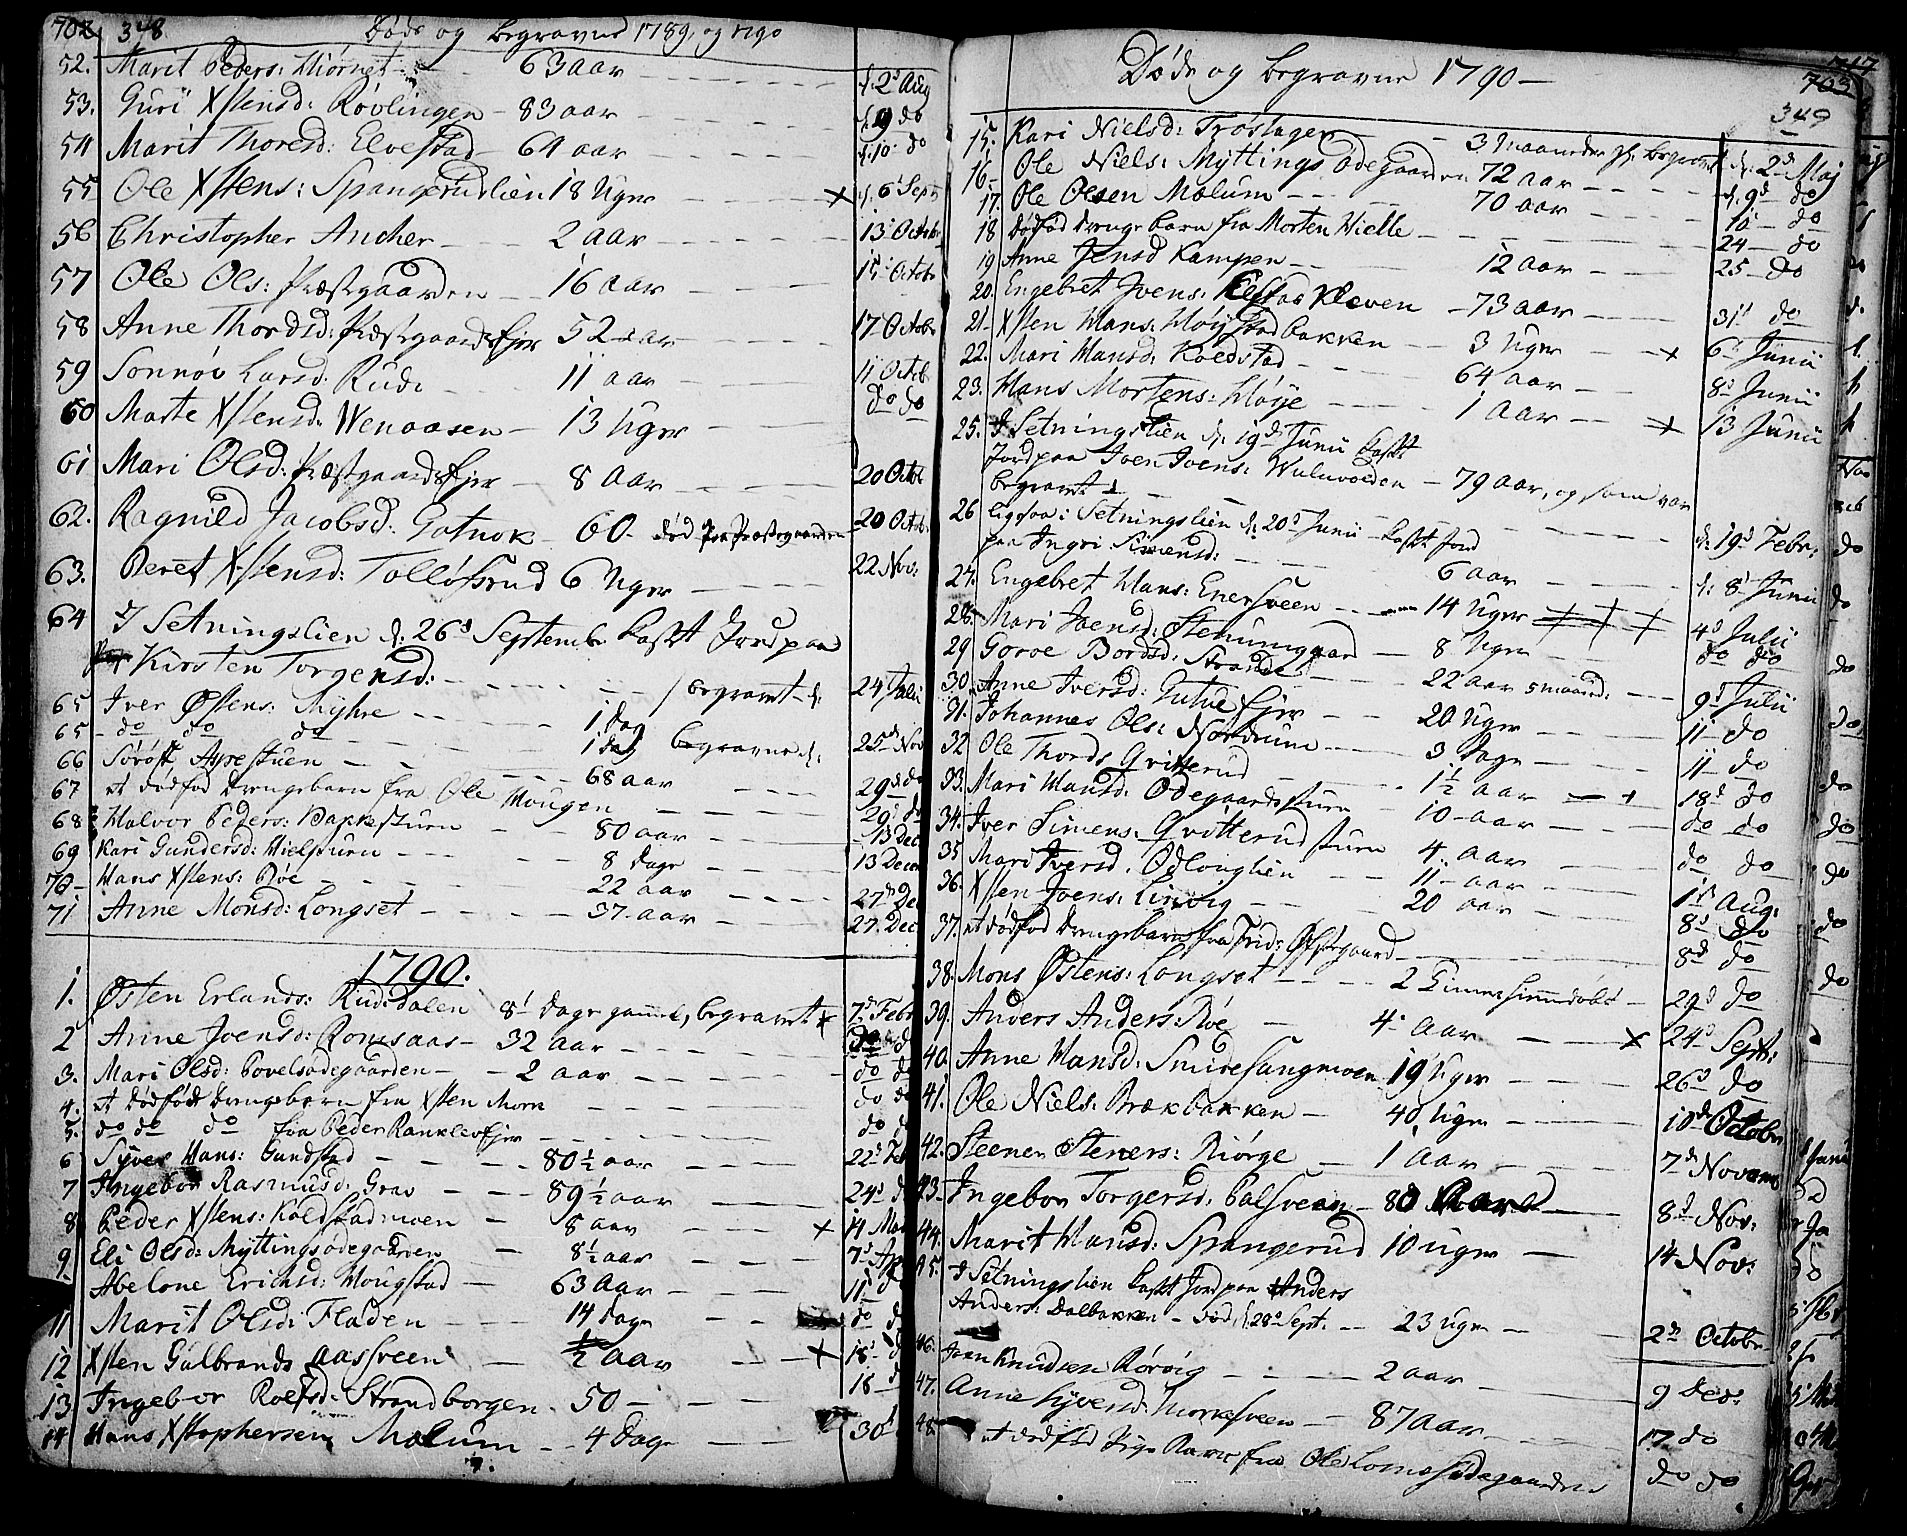 SAH, Ringebu prestekontor, Ministerialbok nr. 3, 1781-1820, s. 348-349